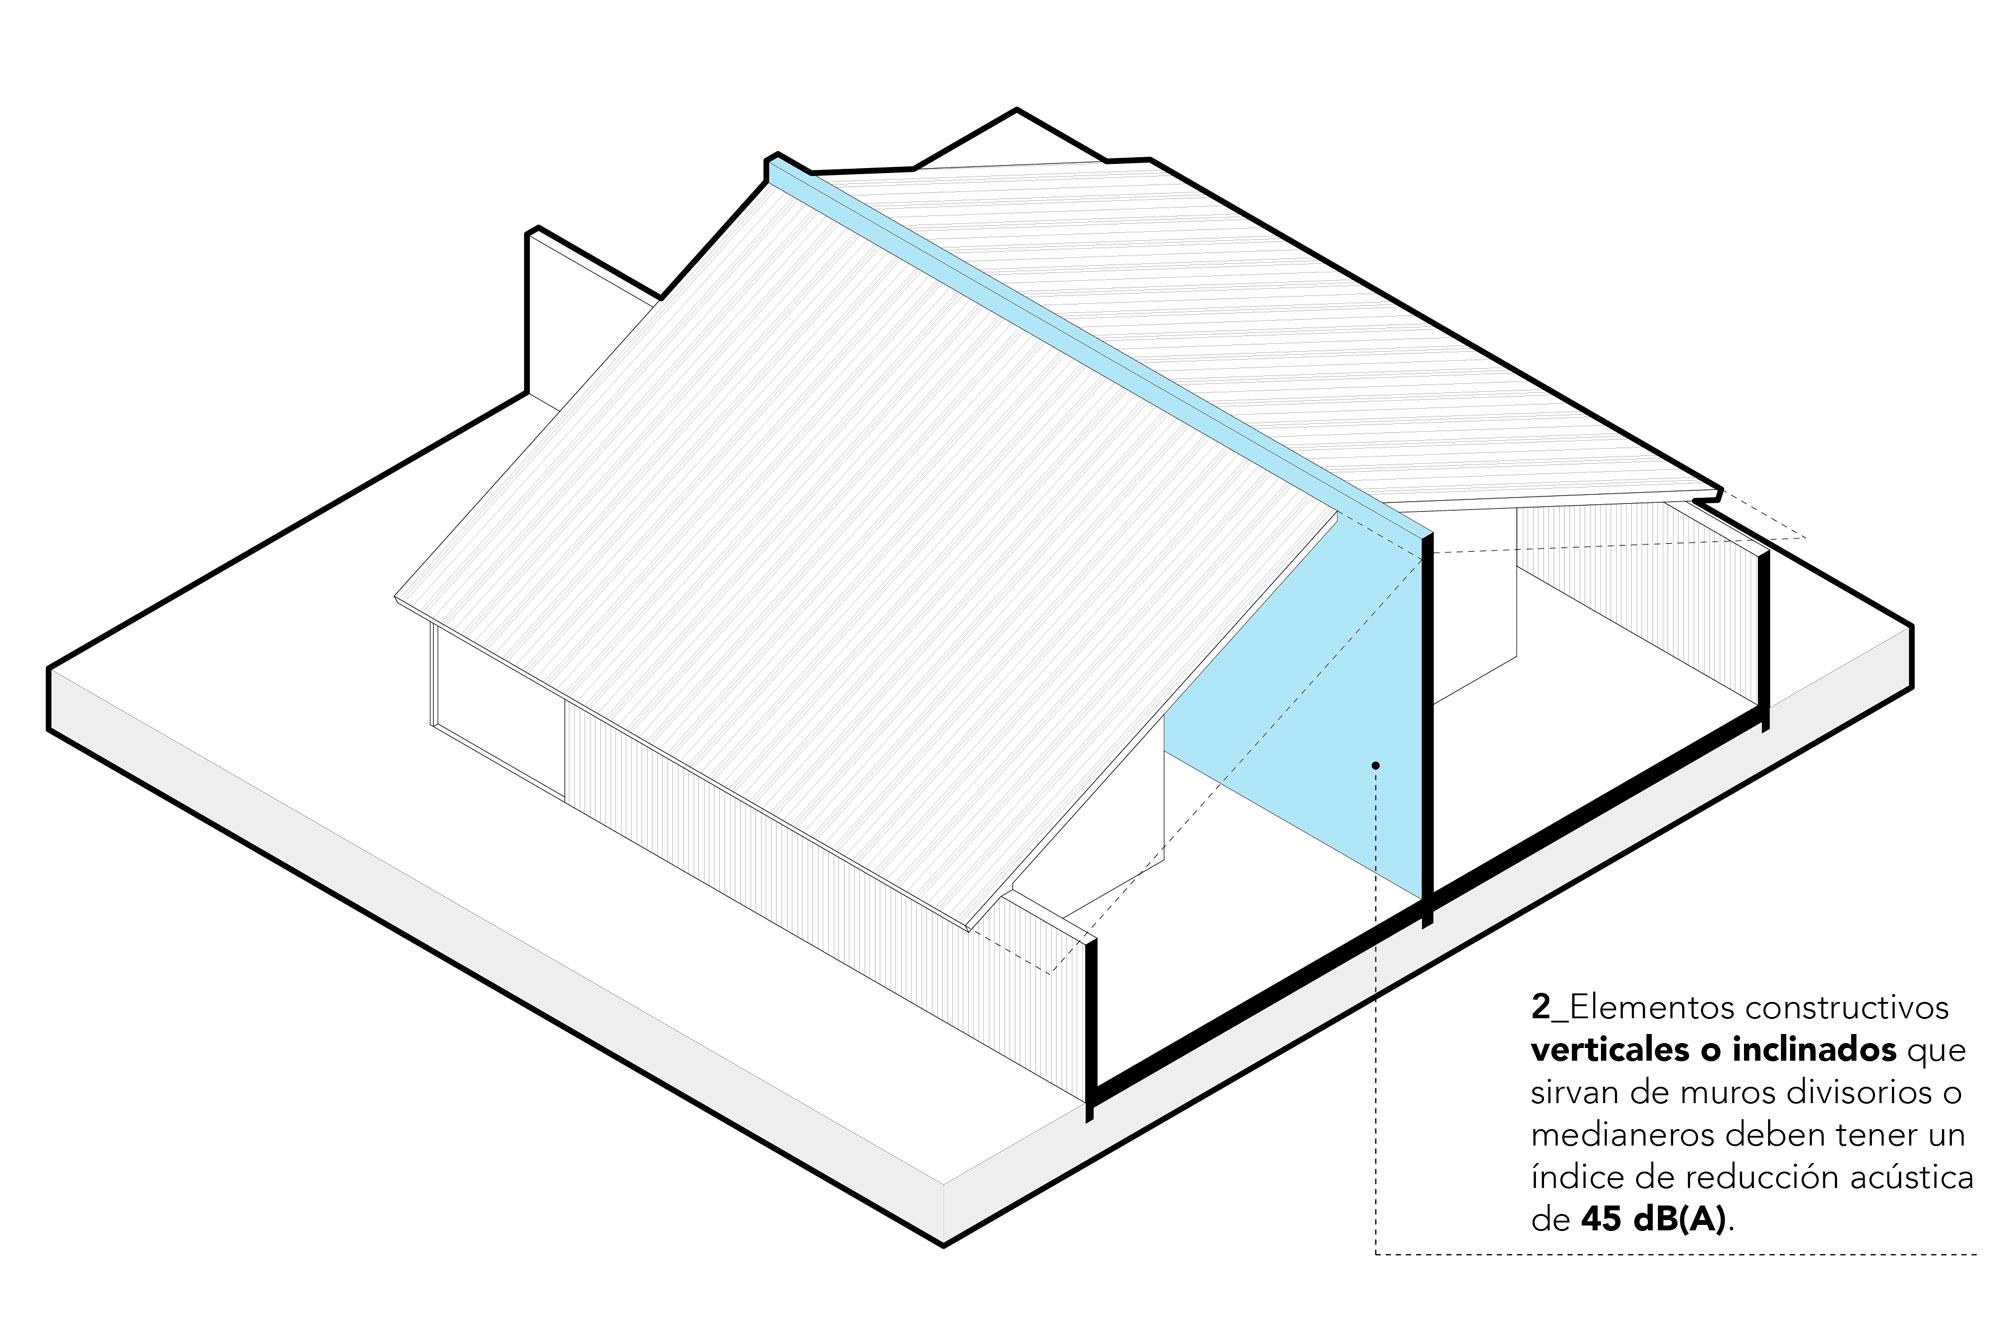 Exigencias acústicas, edificación pareada, OGUC, Chile.